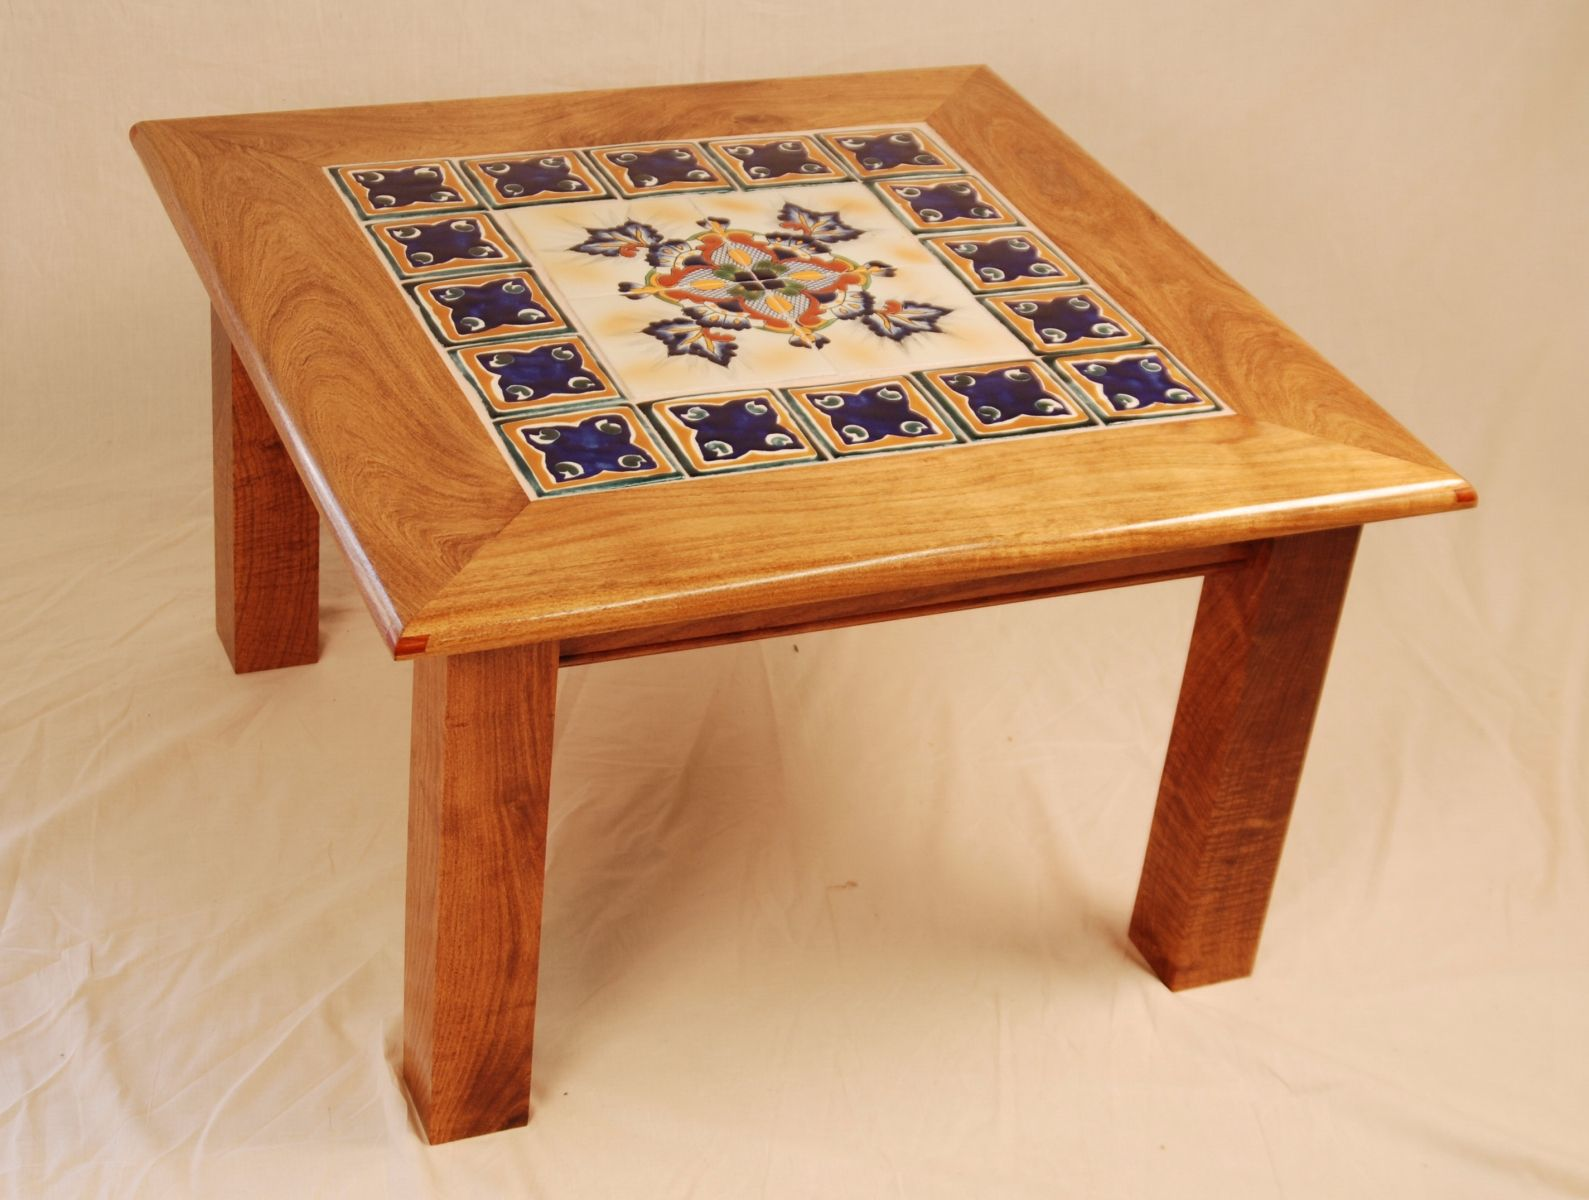 custom made mesquite blue tile table by